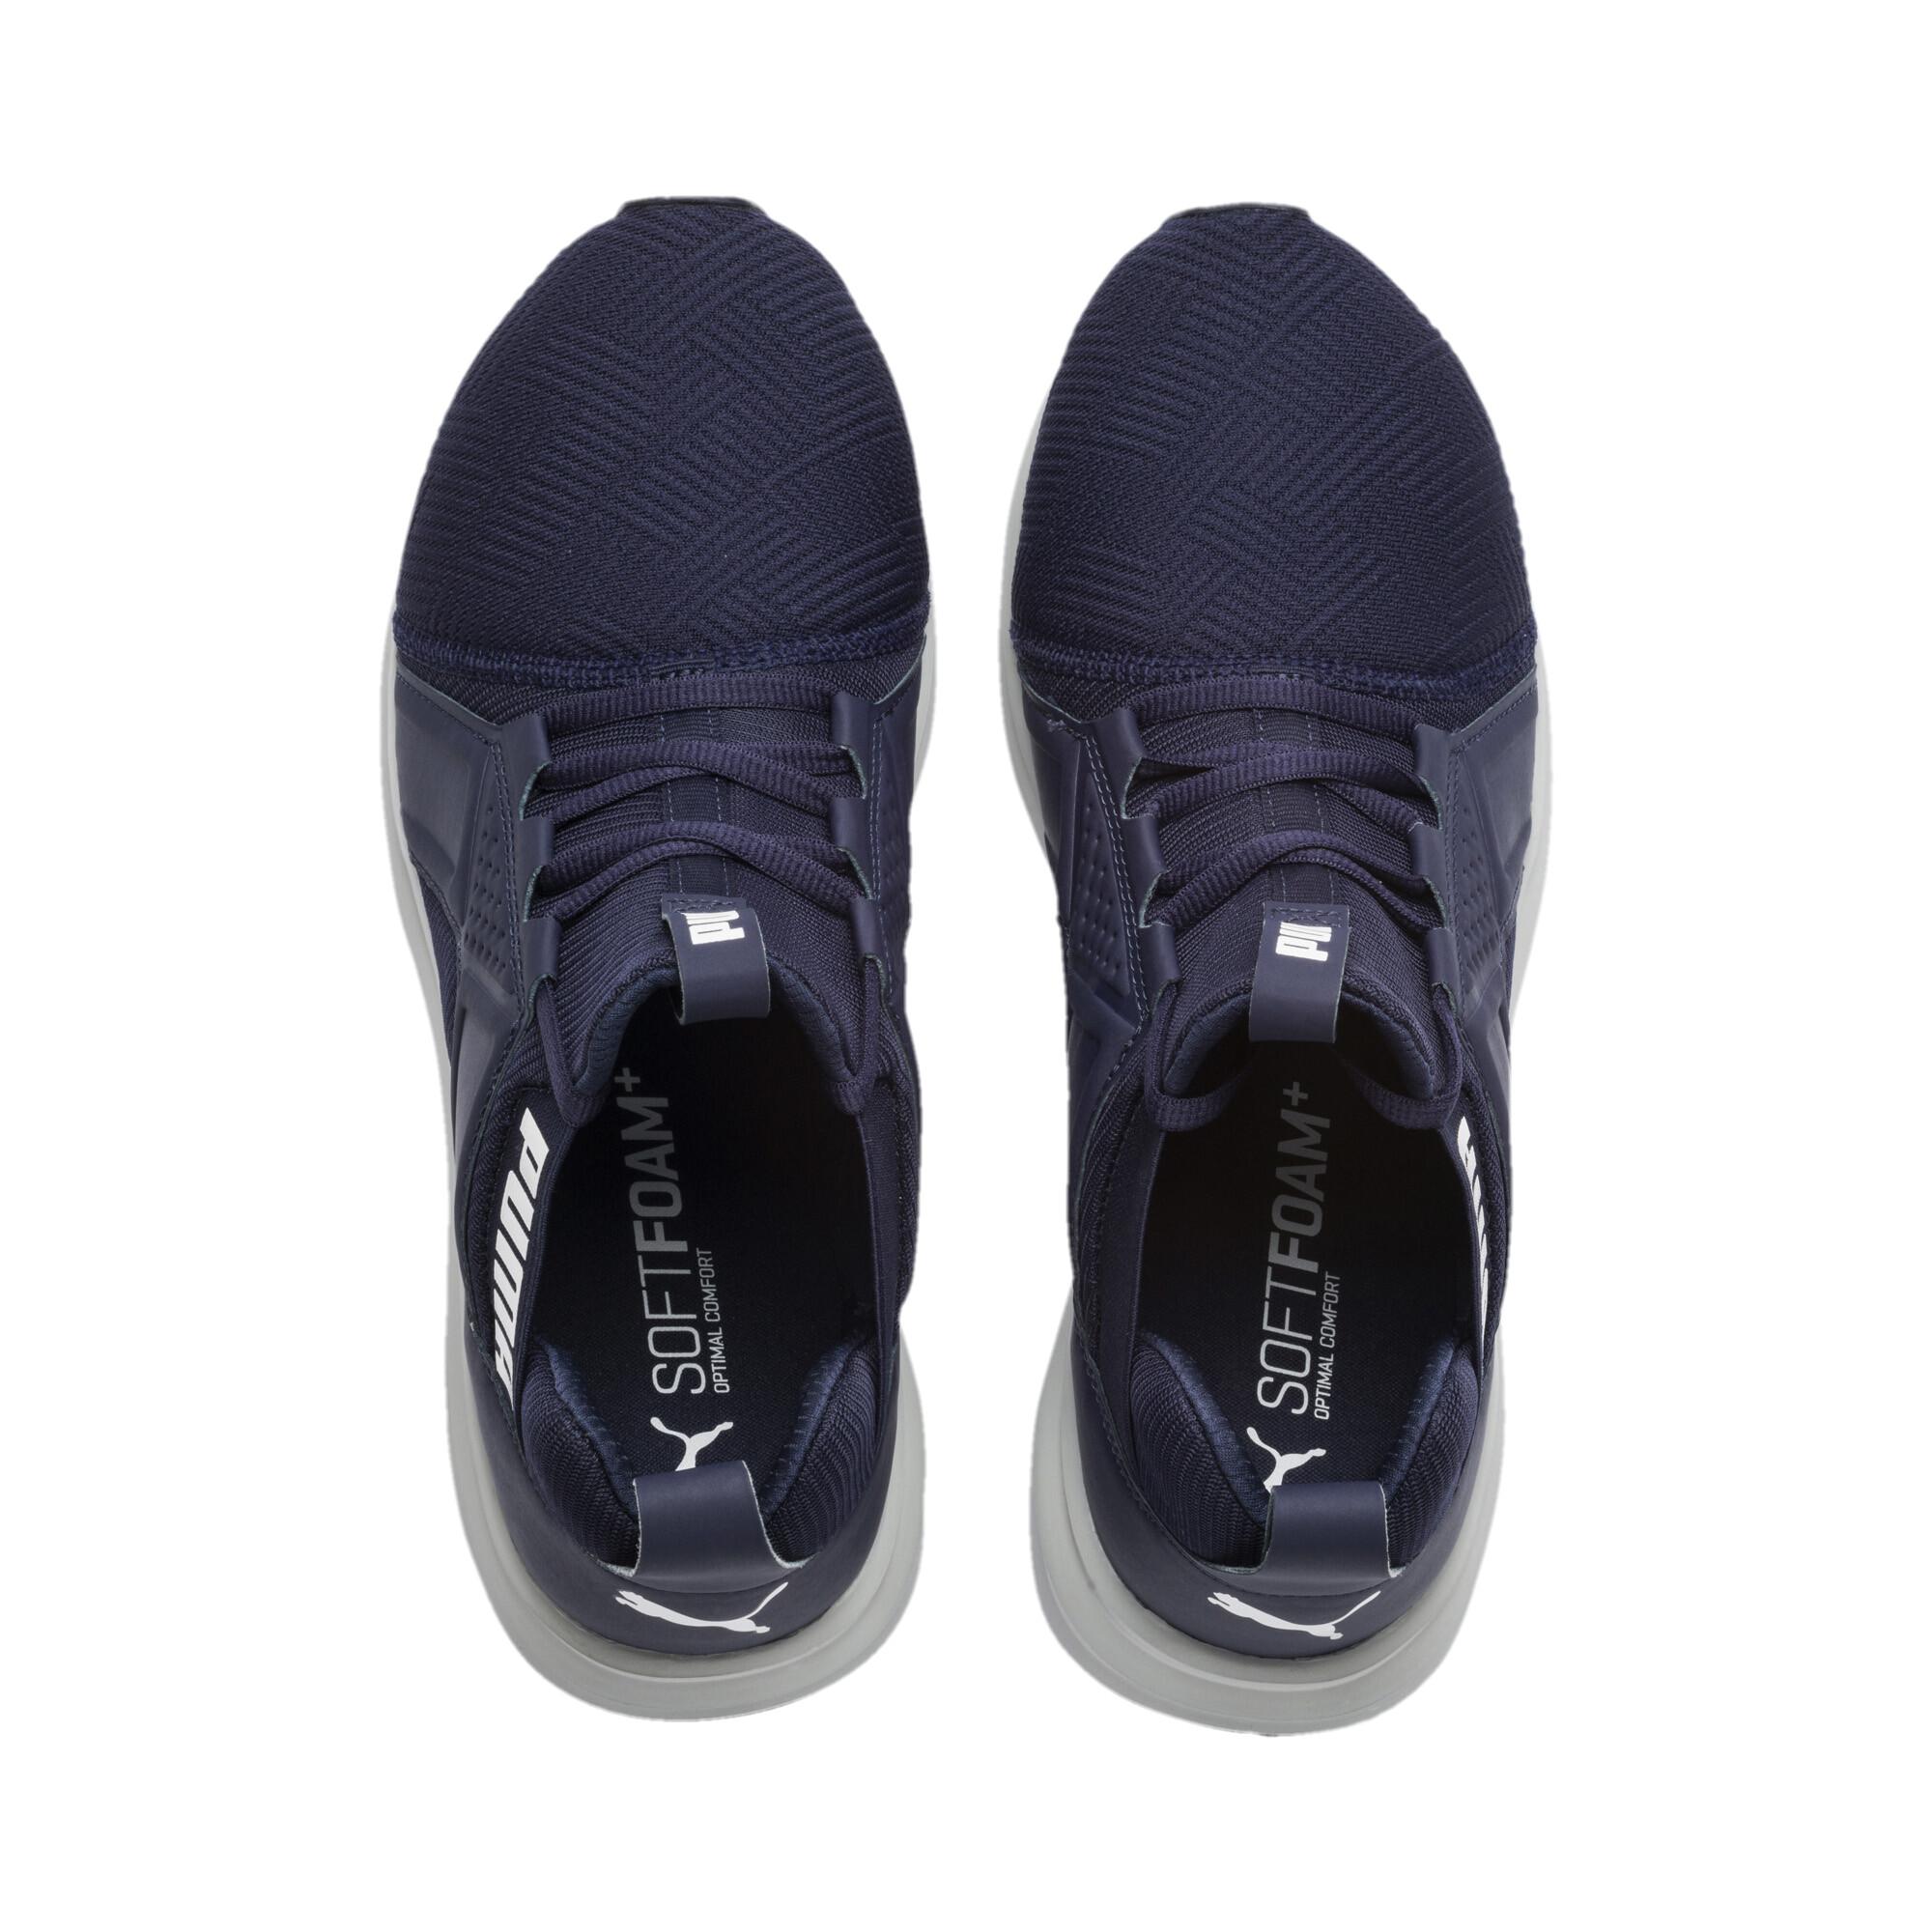 PUMA-Enzo-Geo-Men-s-Sneakers-Men-Shoe-Running thumbnail 7